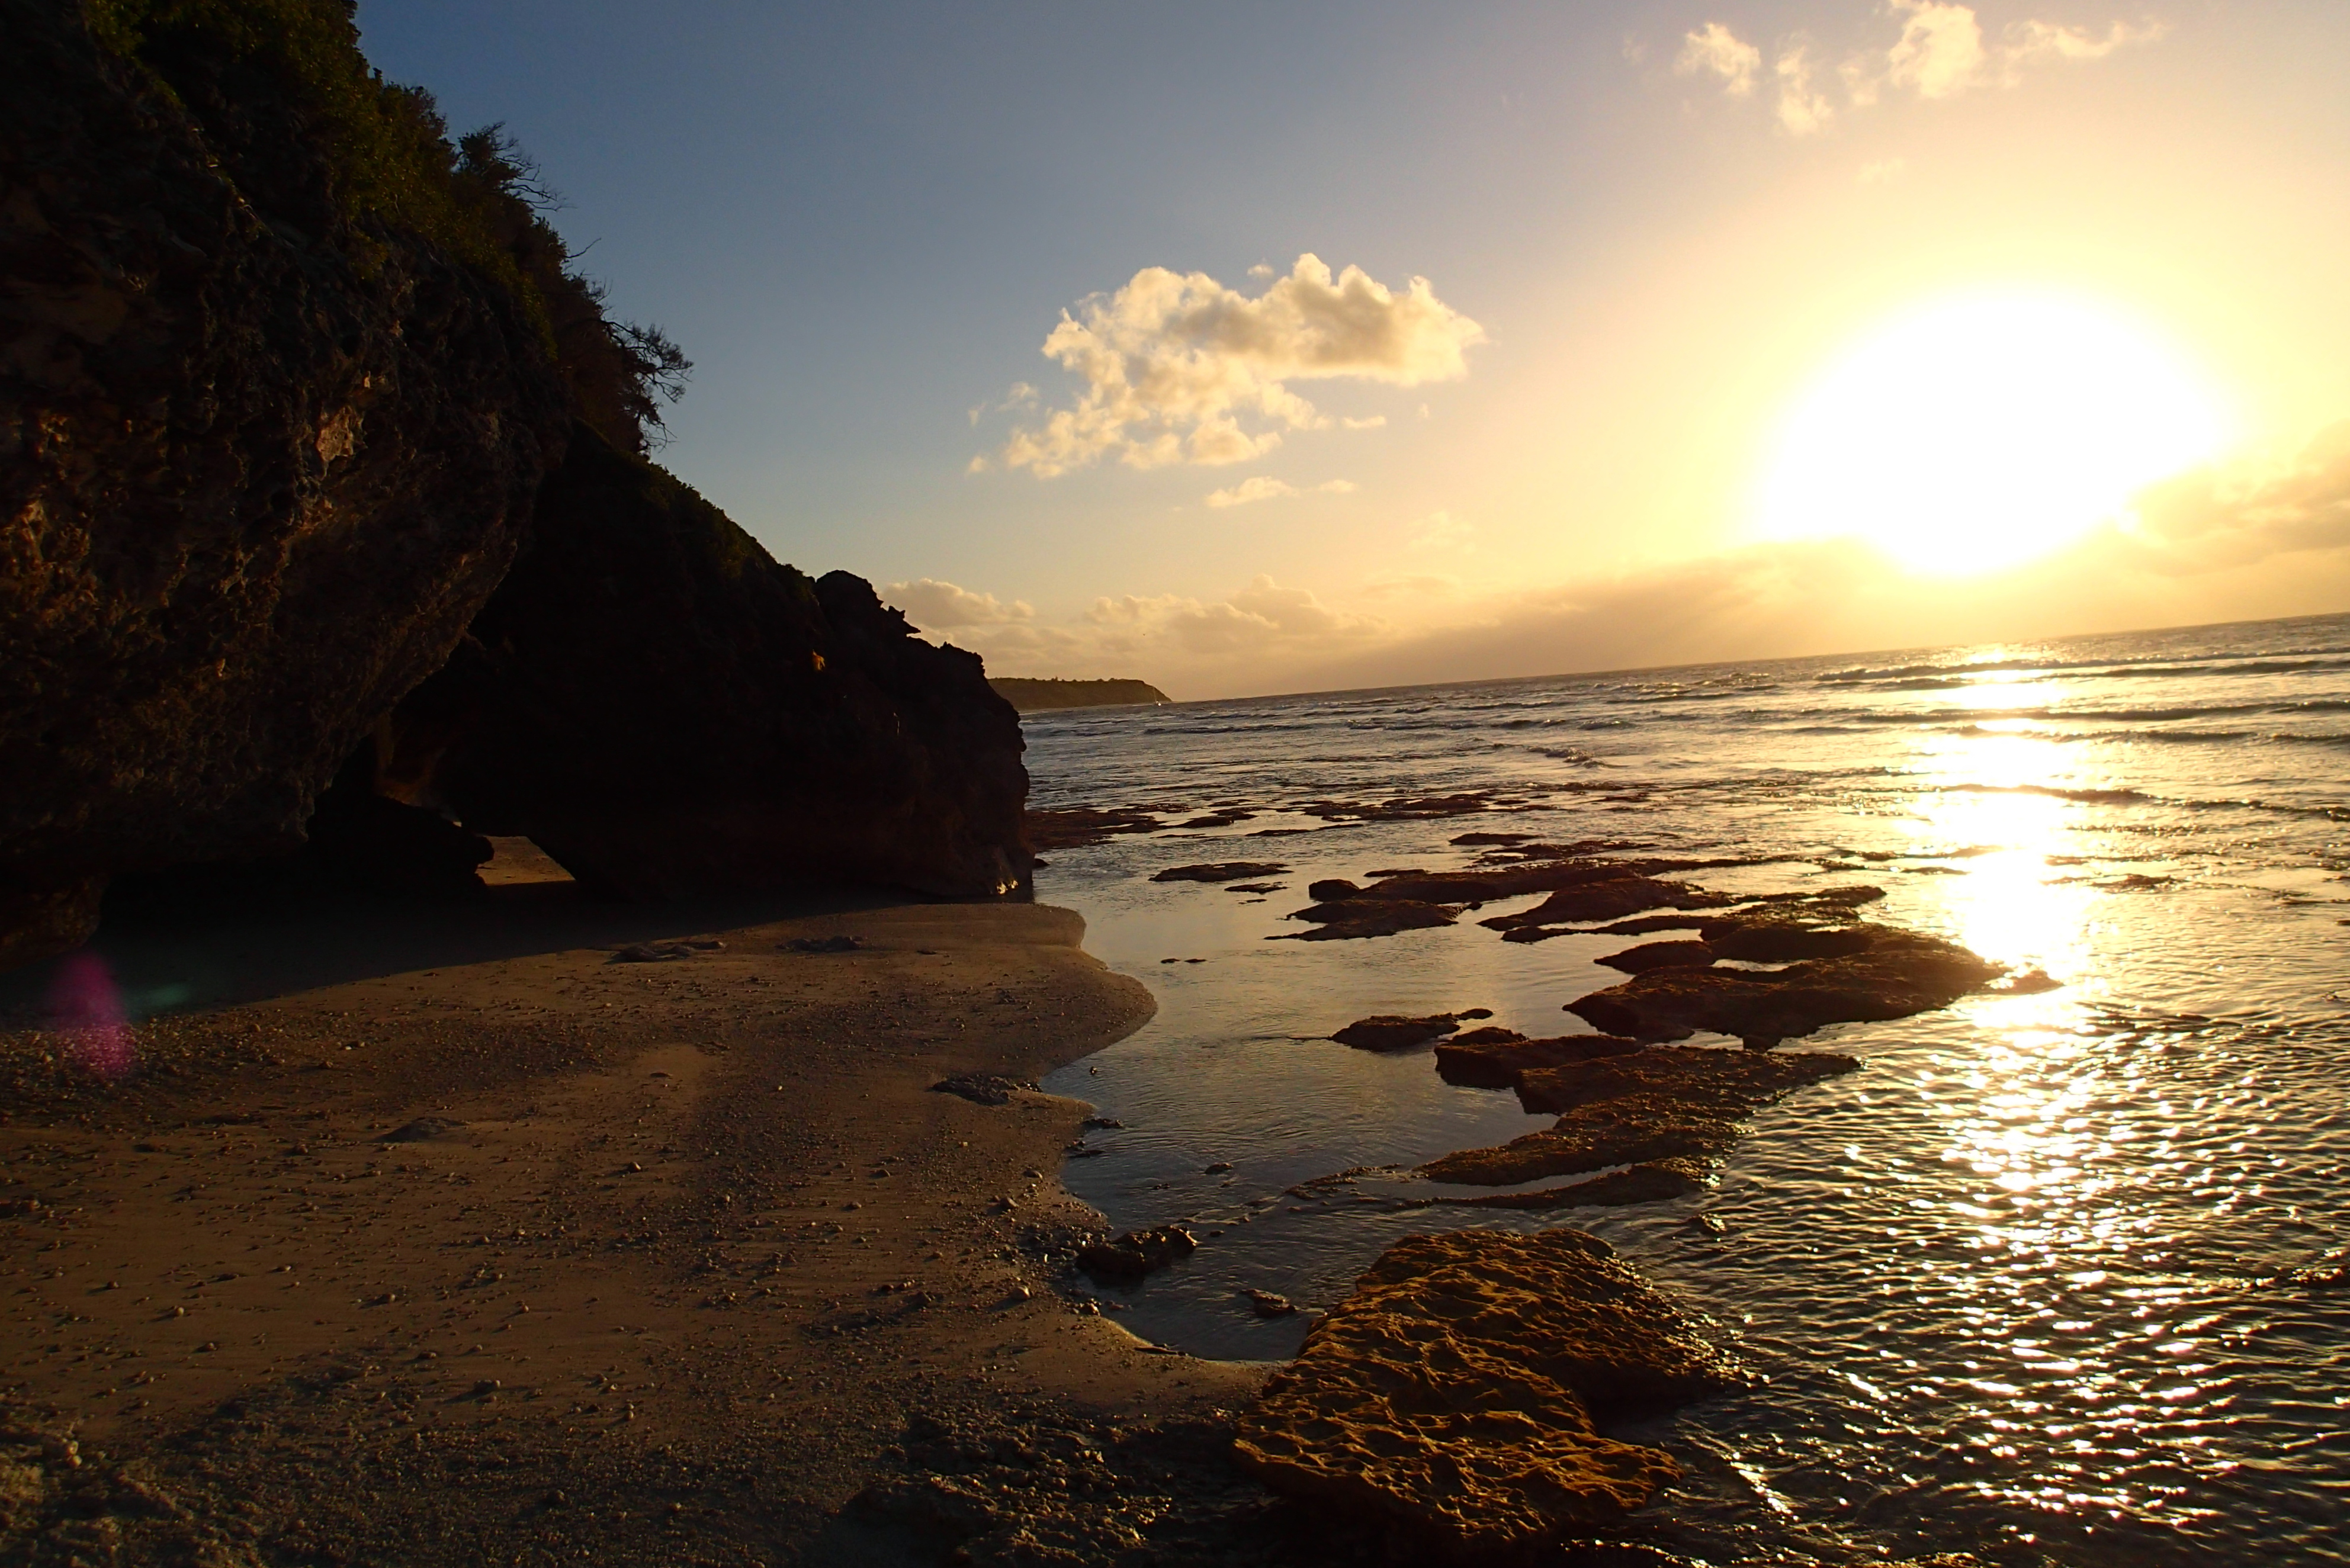 Taravai island sunset